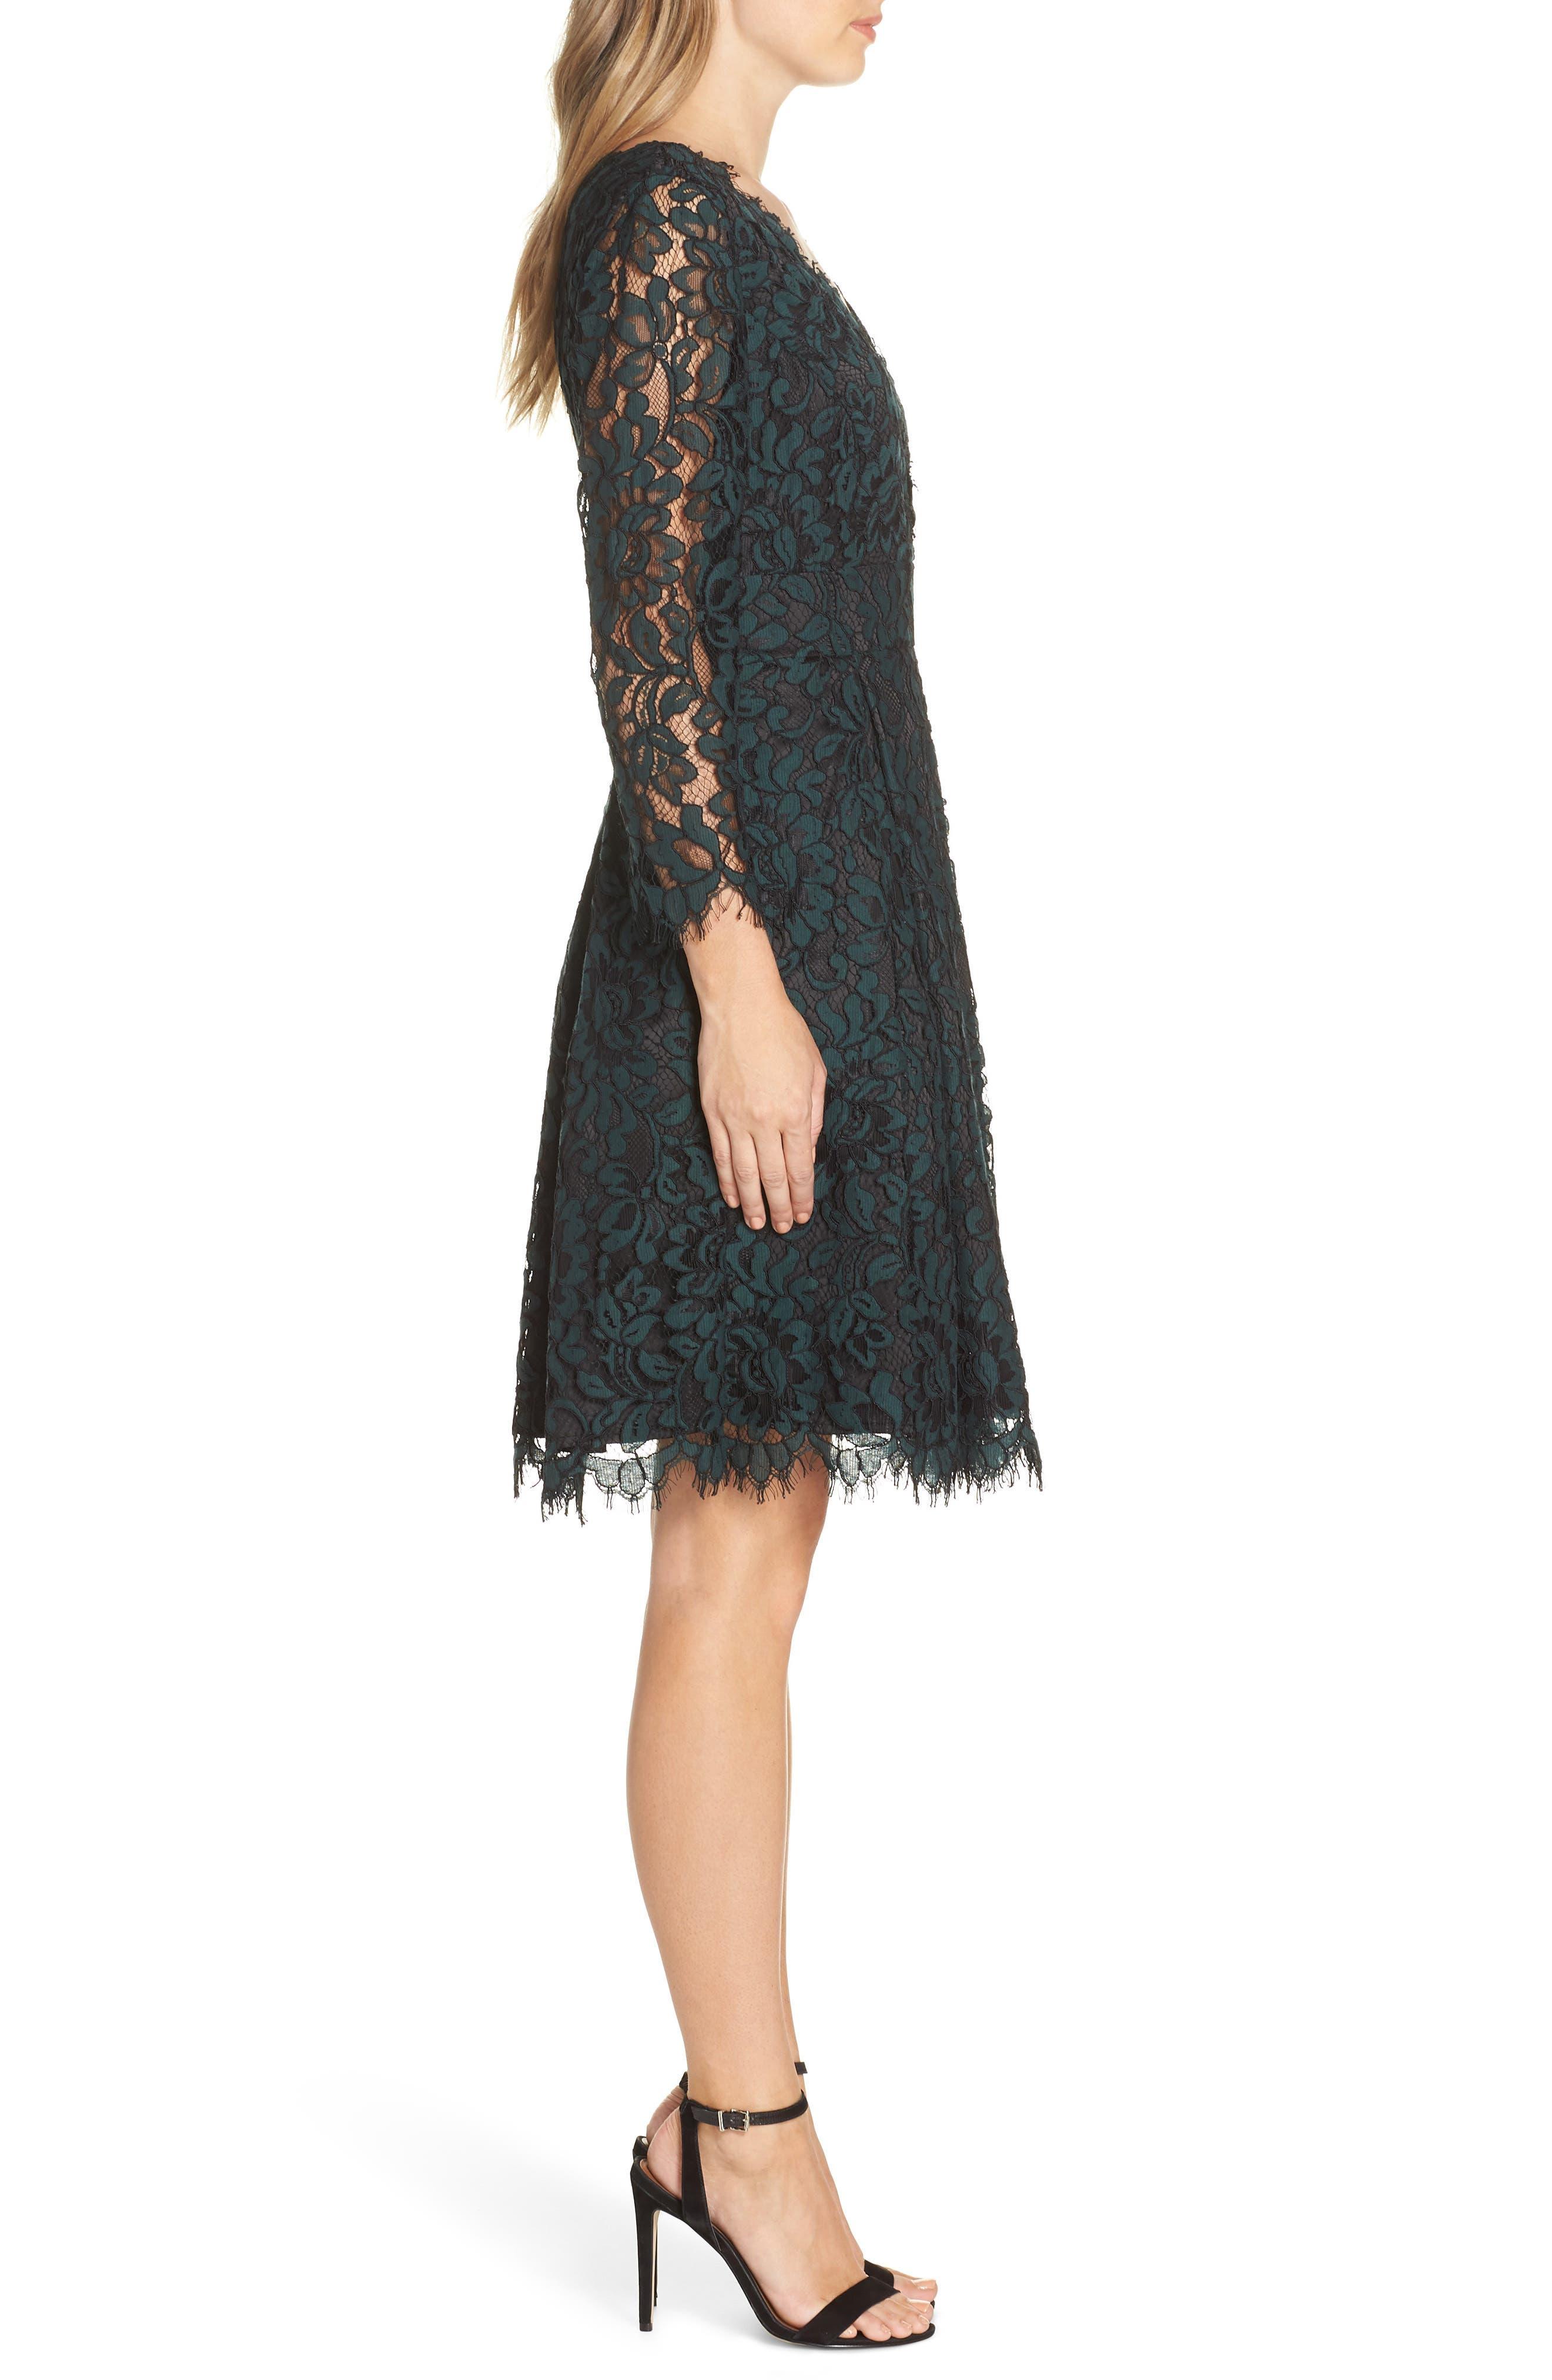 ELIZA J, Lace V-Neck Fit & Flare Dress, Alternate thumbnail 4, color, 310